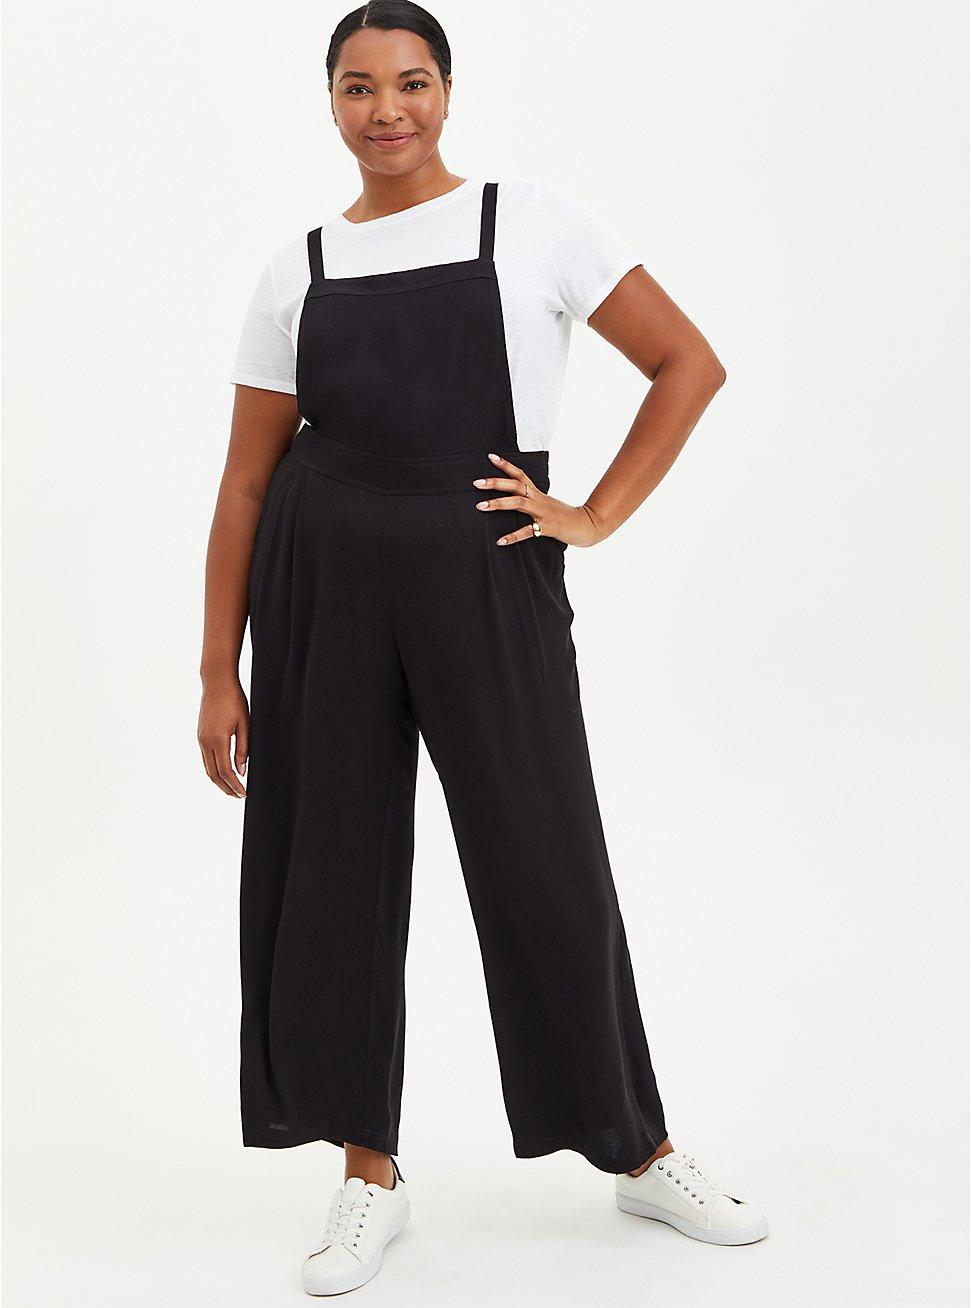 Black Crepe Wide Leg Jumpsuit, DEEP BLACK, hi-res